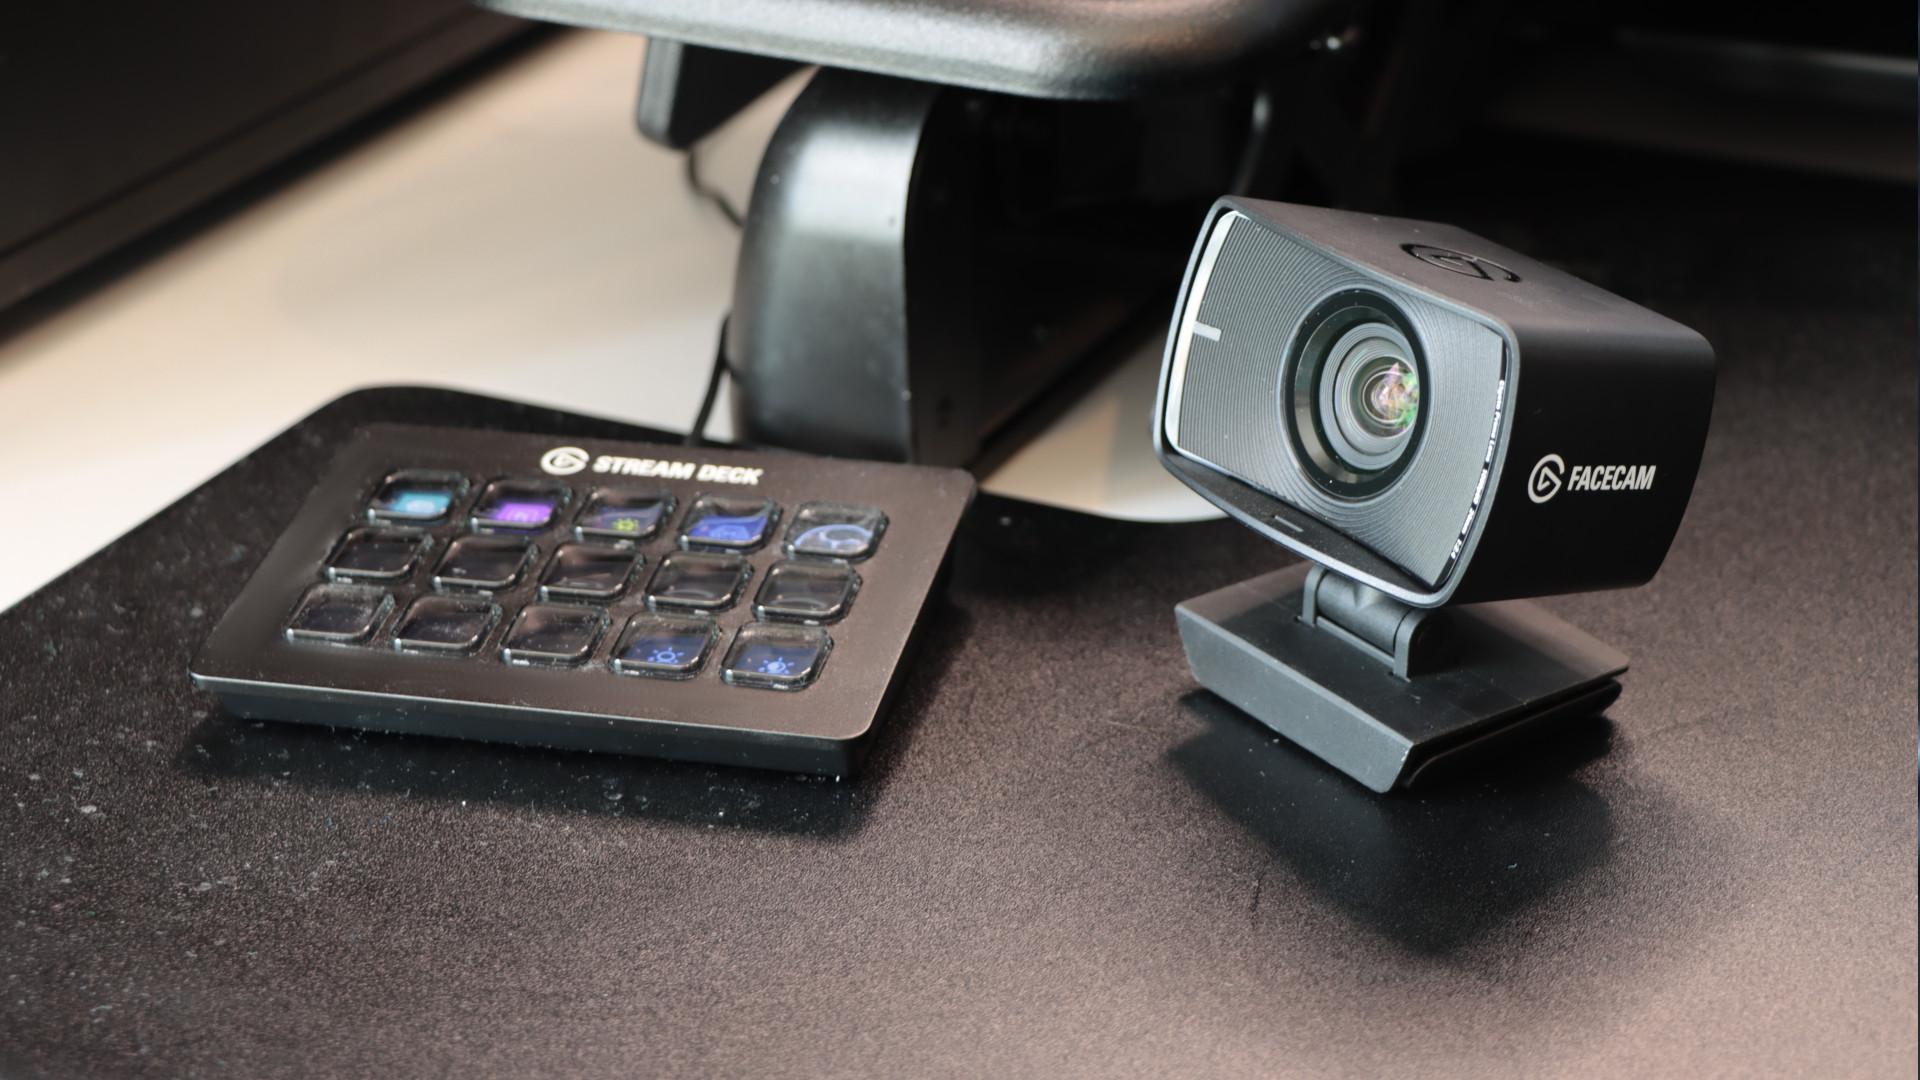 Elgato Facecam and Elgato Streamdeck